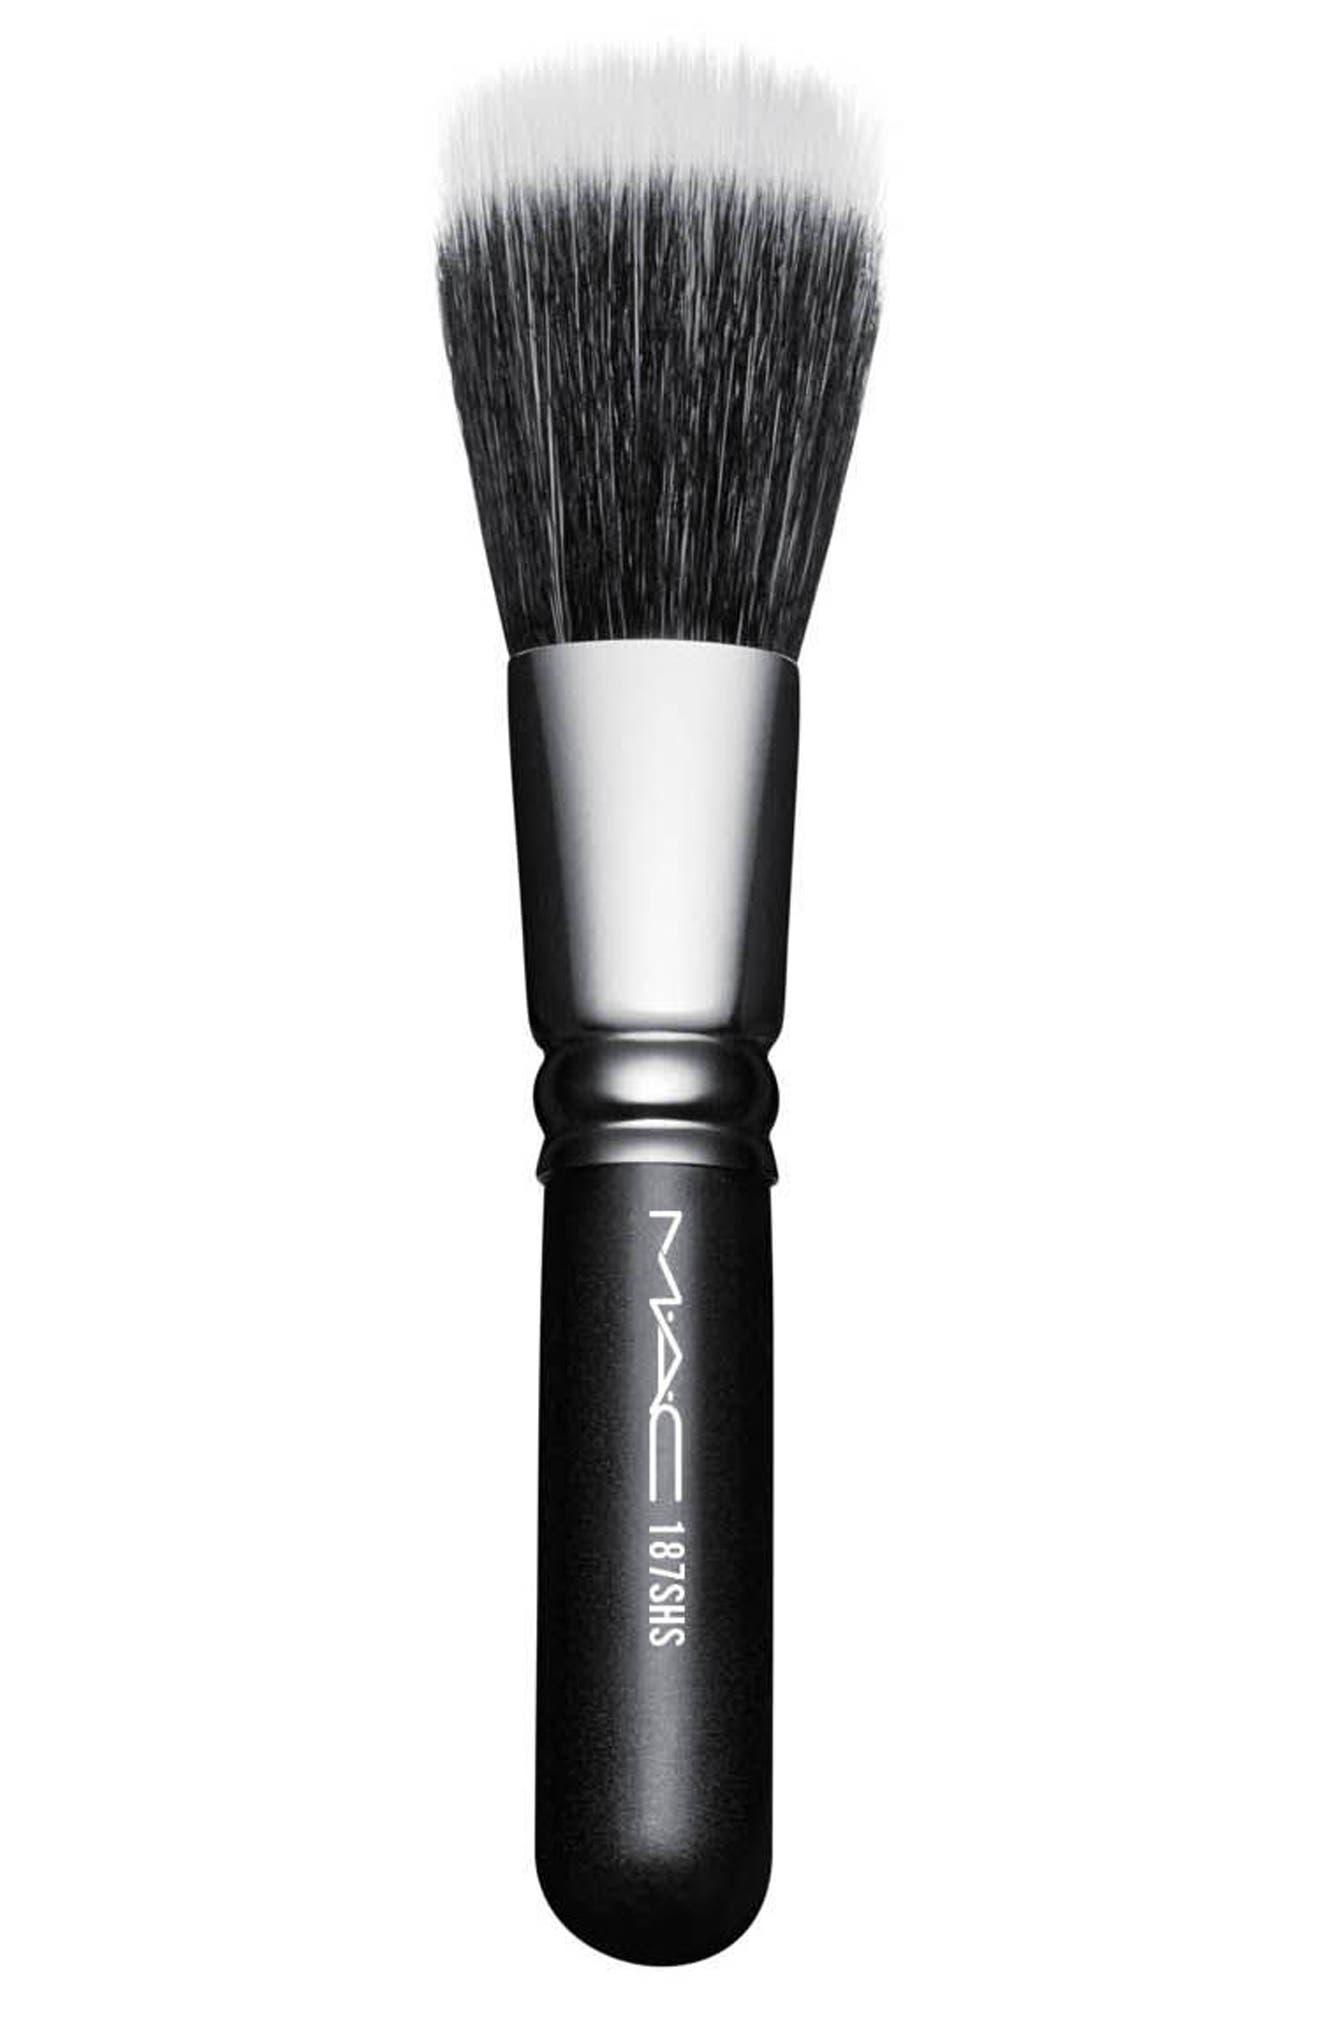 MAC 187SH Duo Fibre Face Brush,                             Main thumbnail 1, color,                             NO COLOR